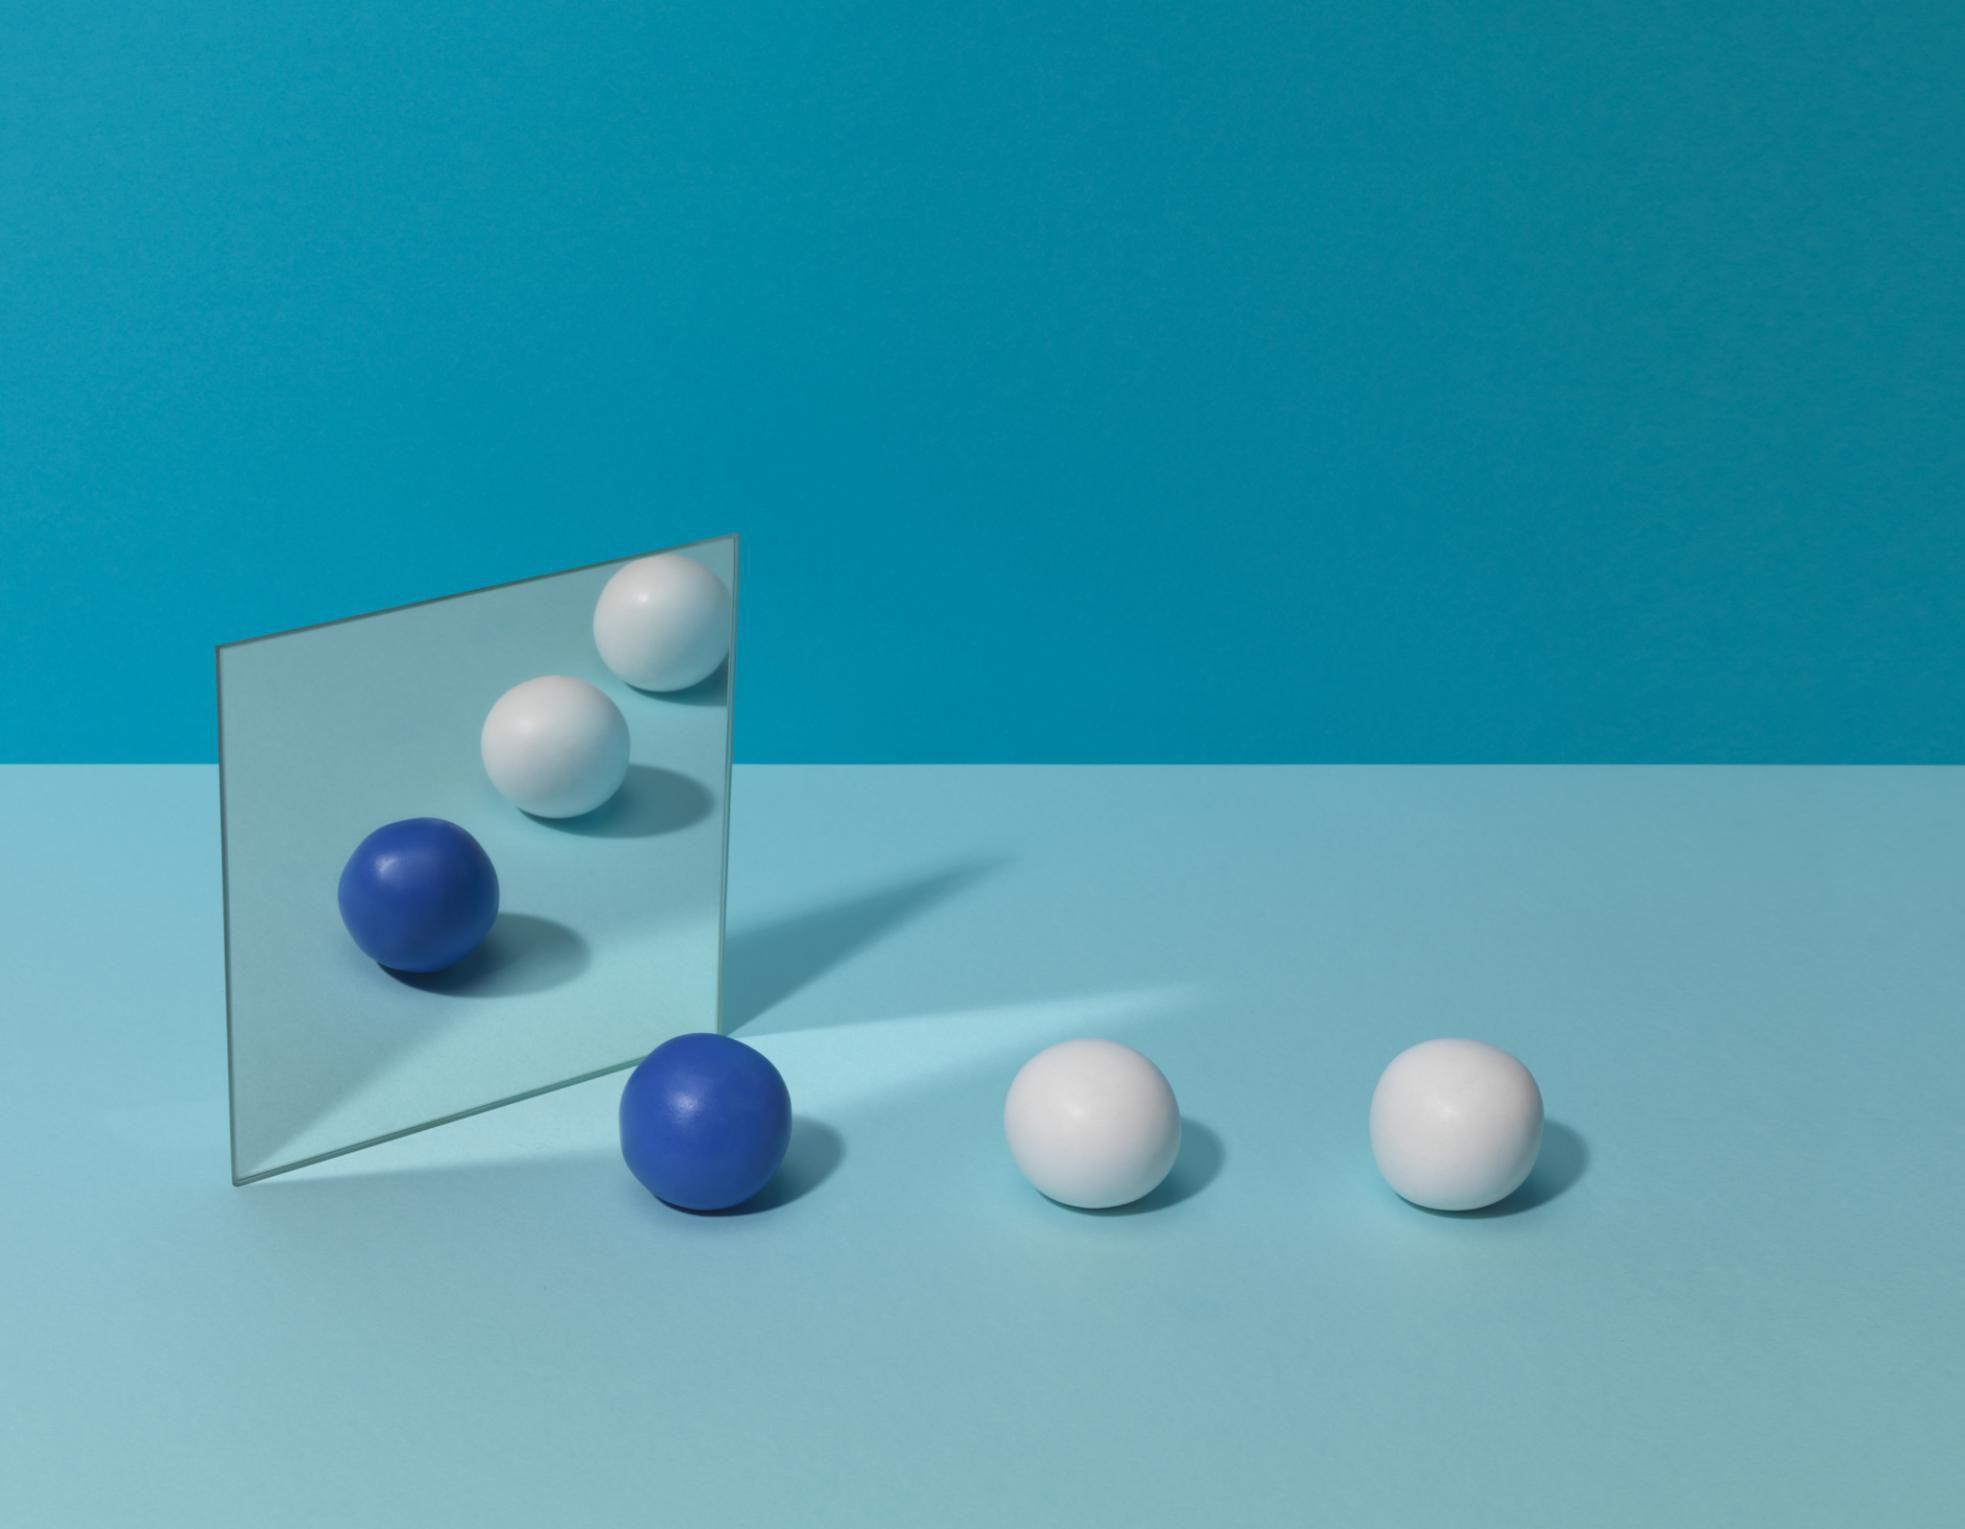 Worksheet Symmetry In Nature